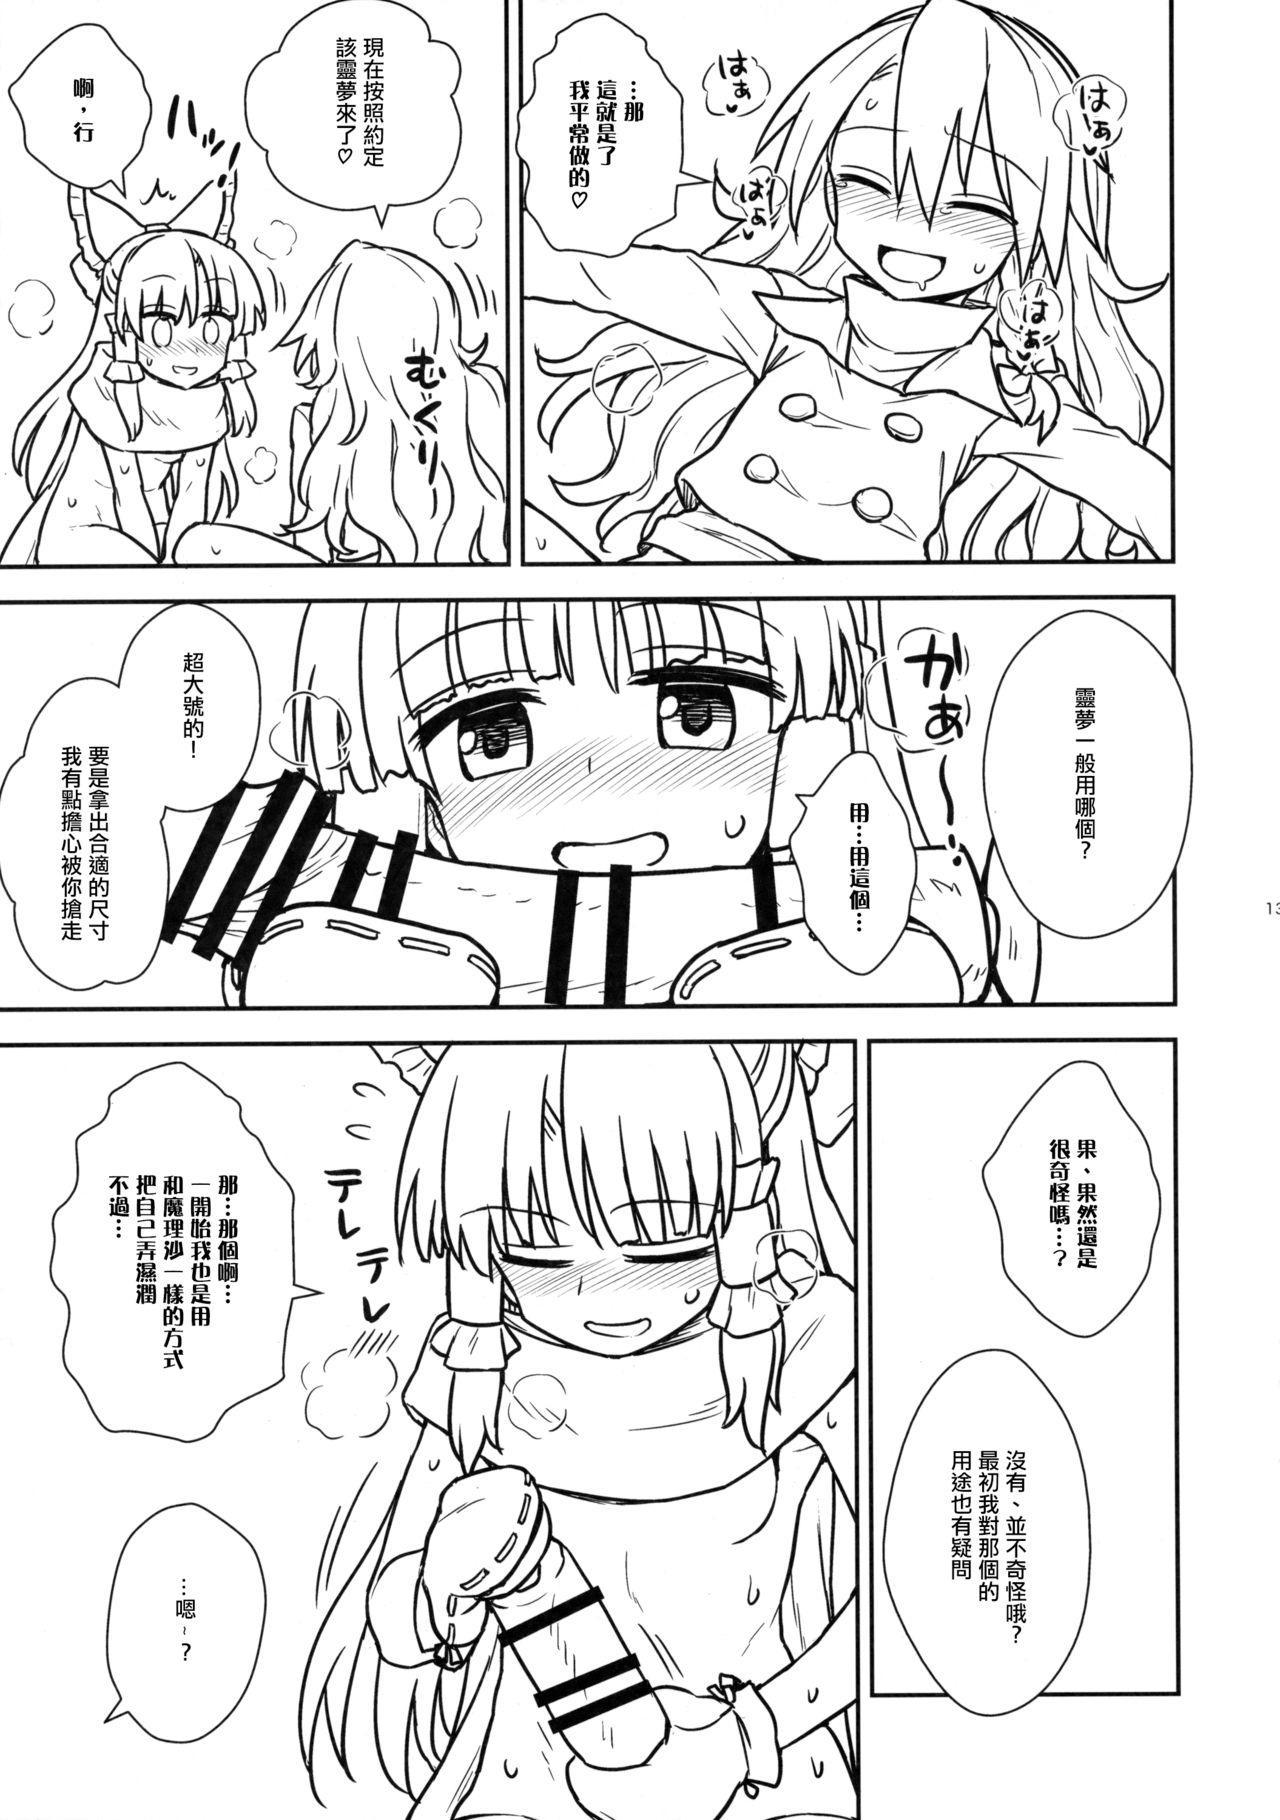 (C91) [110-GROOVE (Itou Yuuji)] Otoshigoro no Reimu-san to Marisa-san (Touhou Project) [Chinese] [冴月麟个人汉化] 11